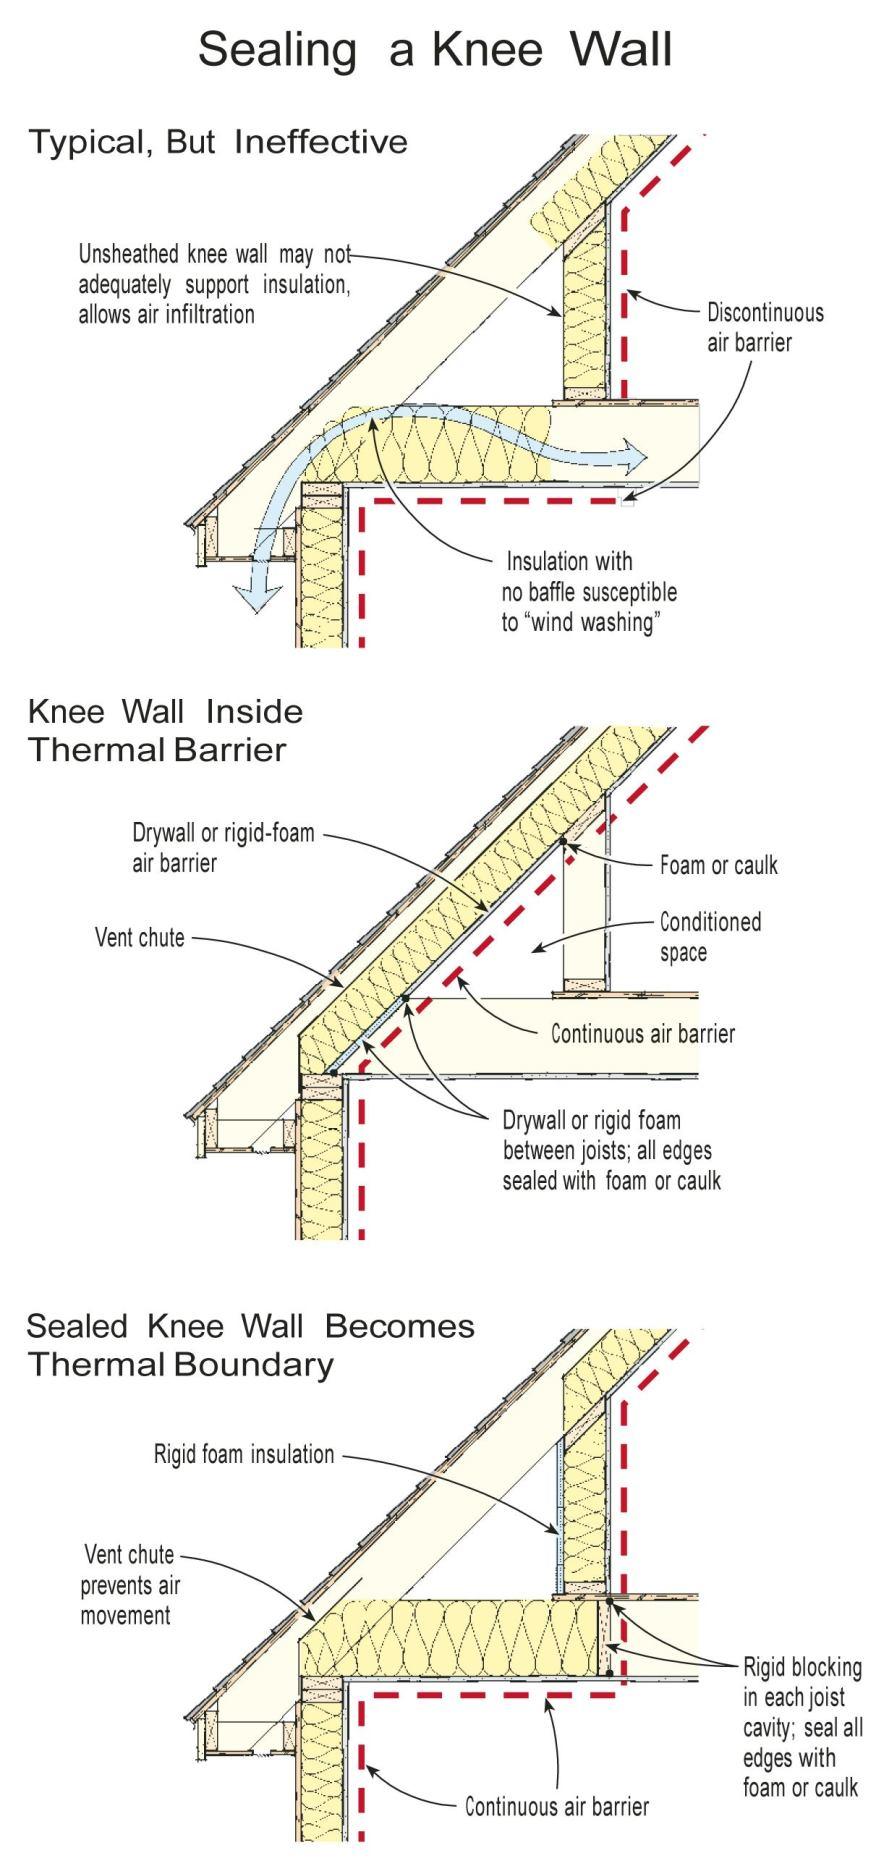 Spray Foaming Directly Under Board Sheathing Decks?-1.jpg